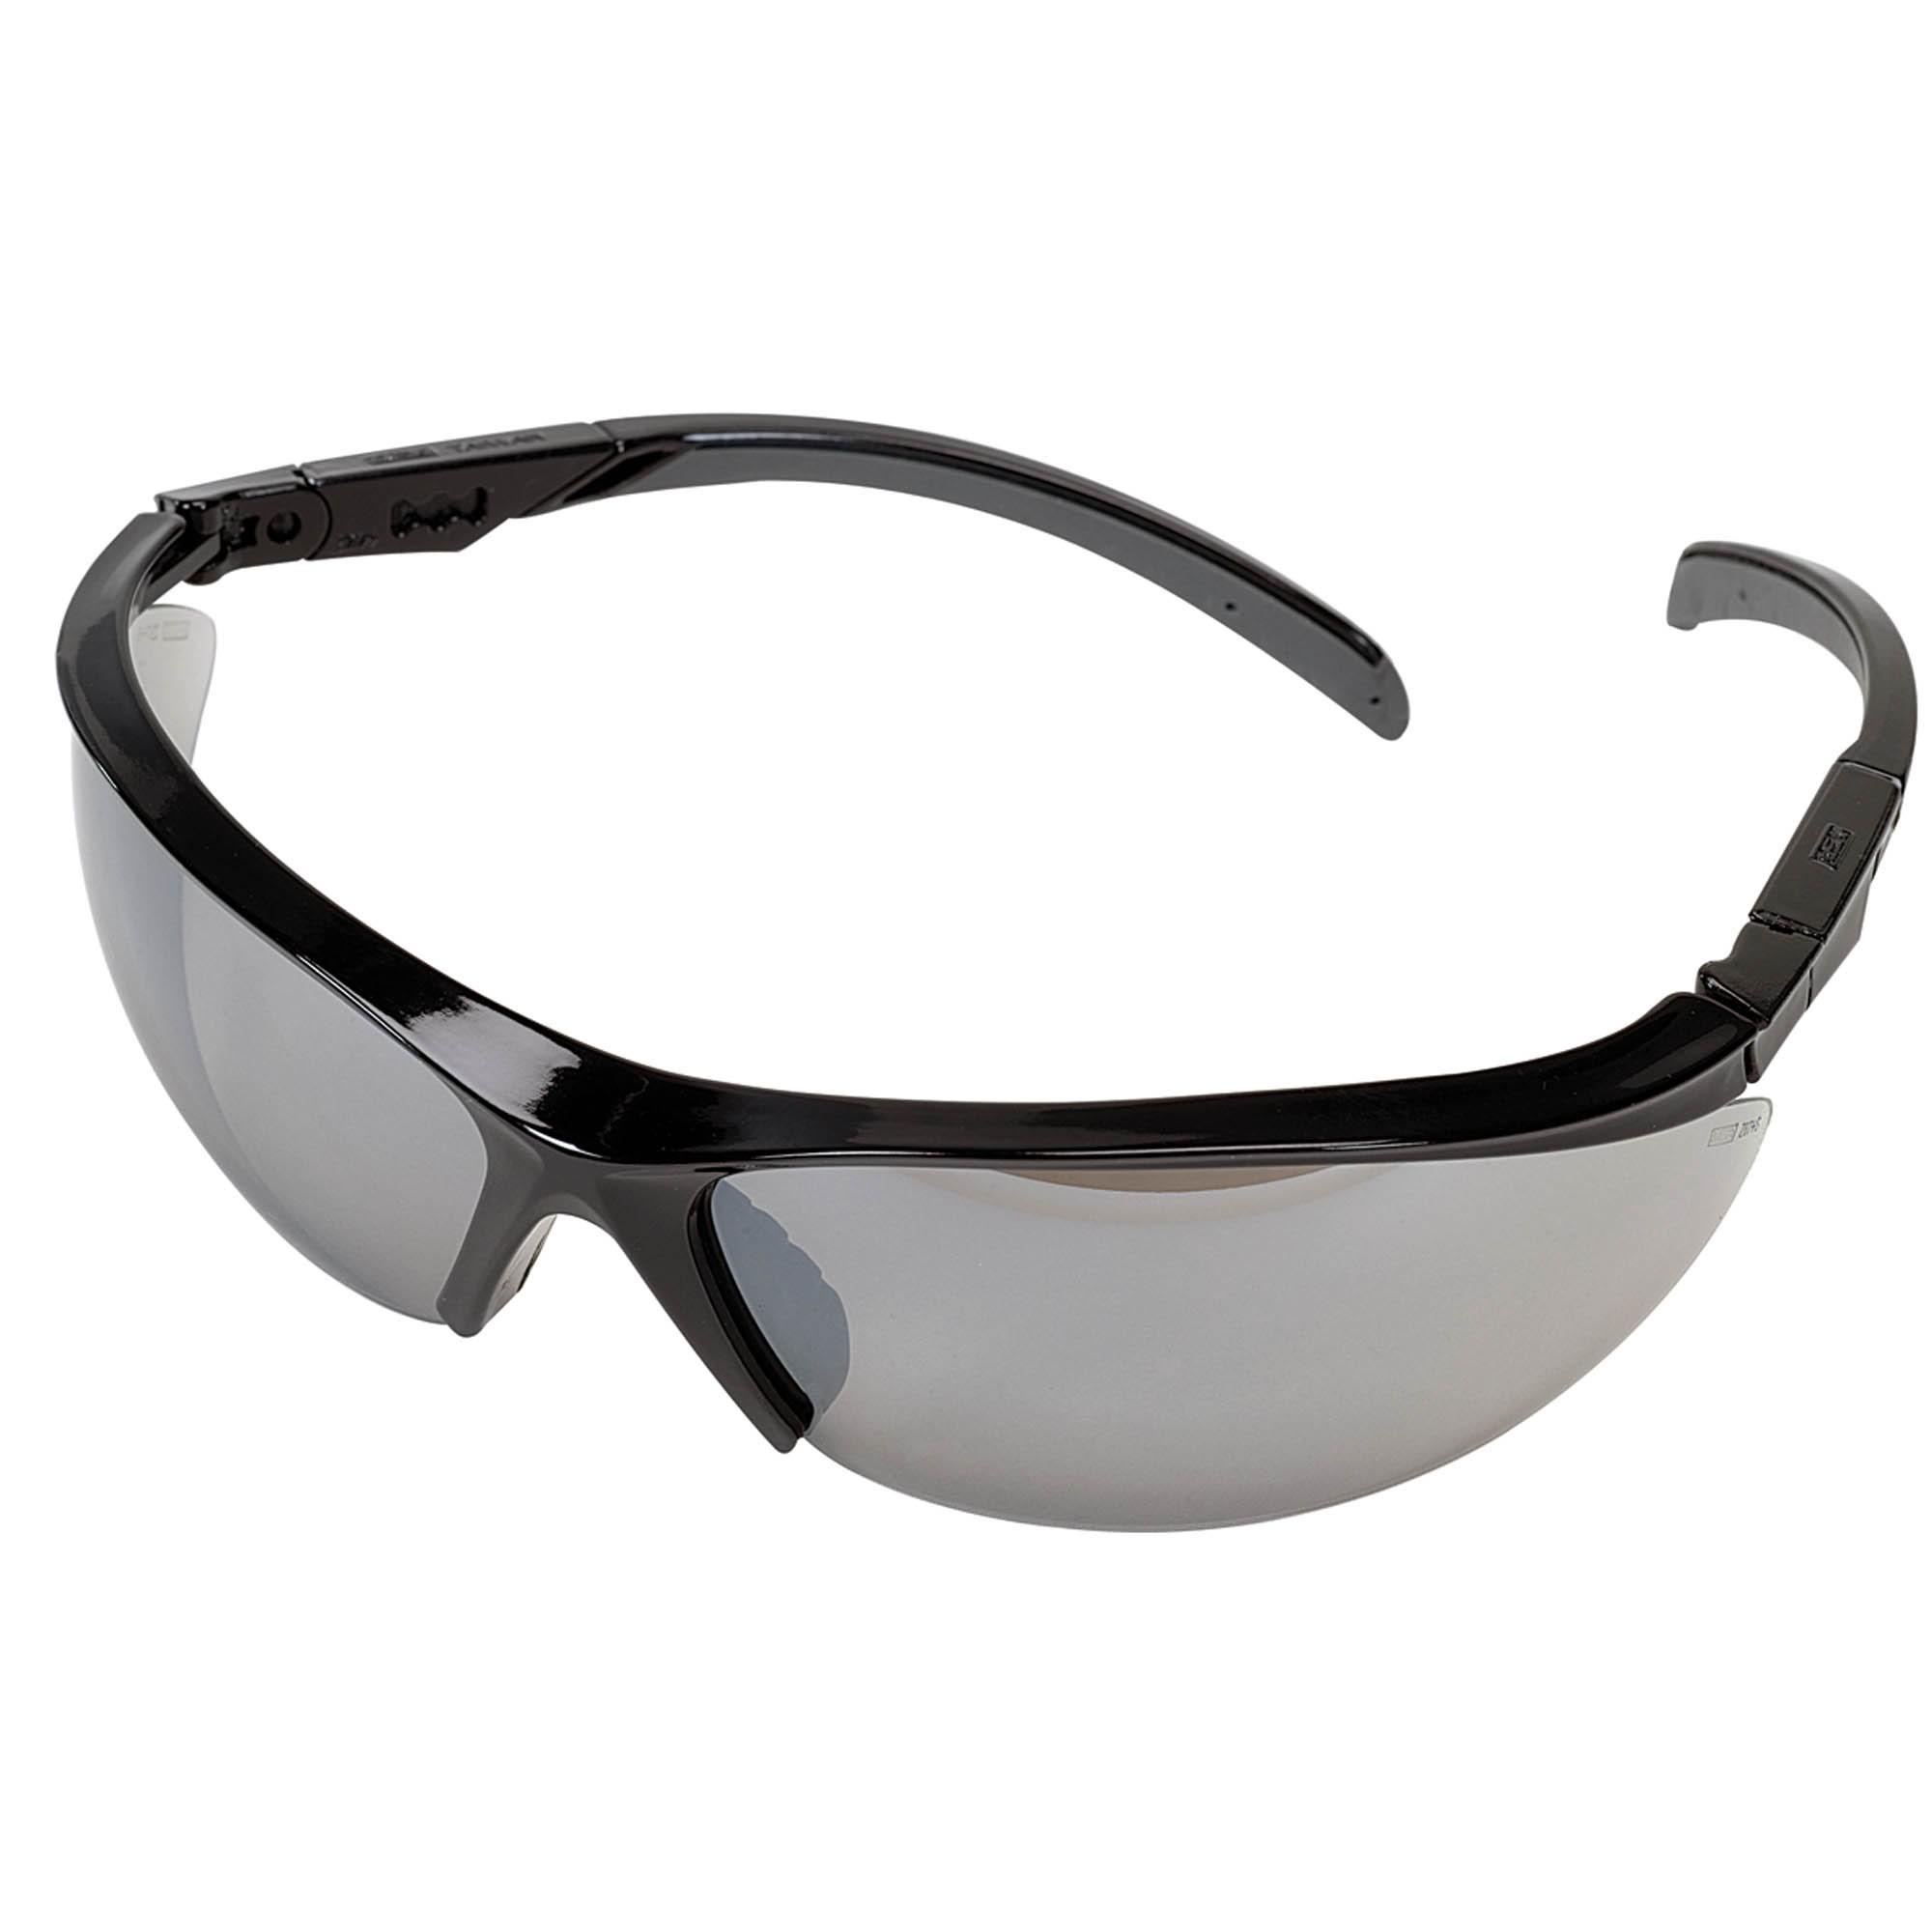 Adjusting Eyeglass Frame Temples : MSA 10119758 Essential Adjust Eyewear - Dark Blue/Gray ...